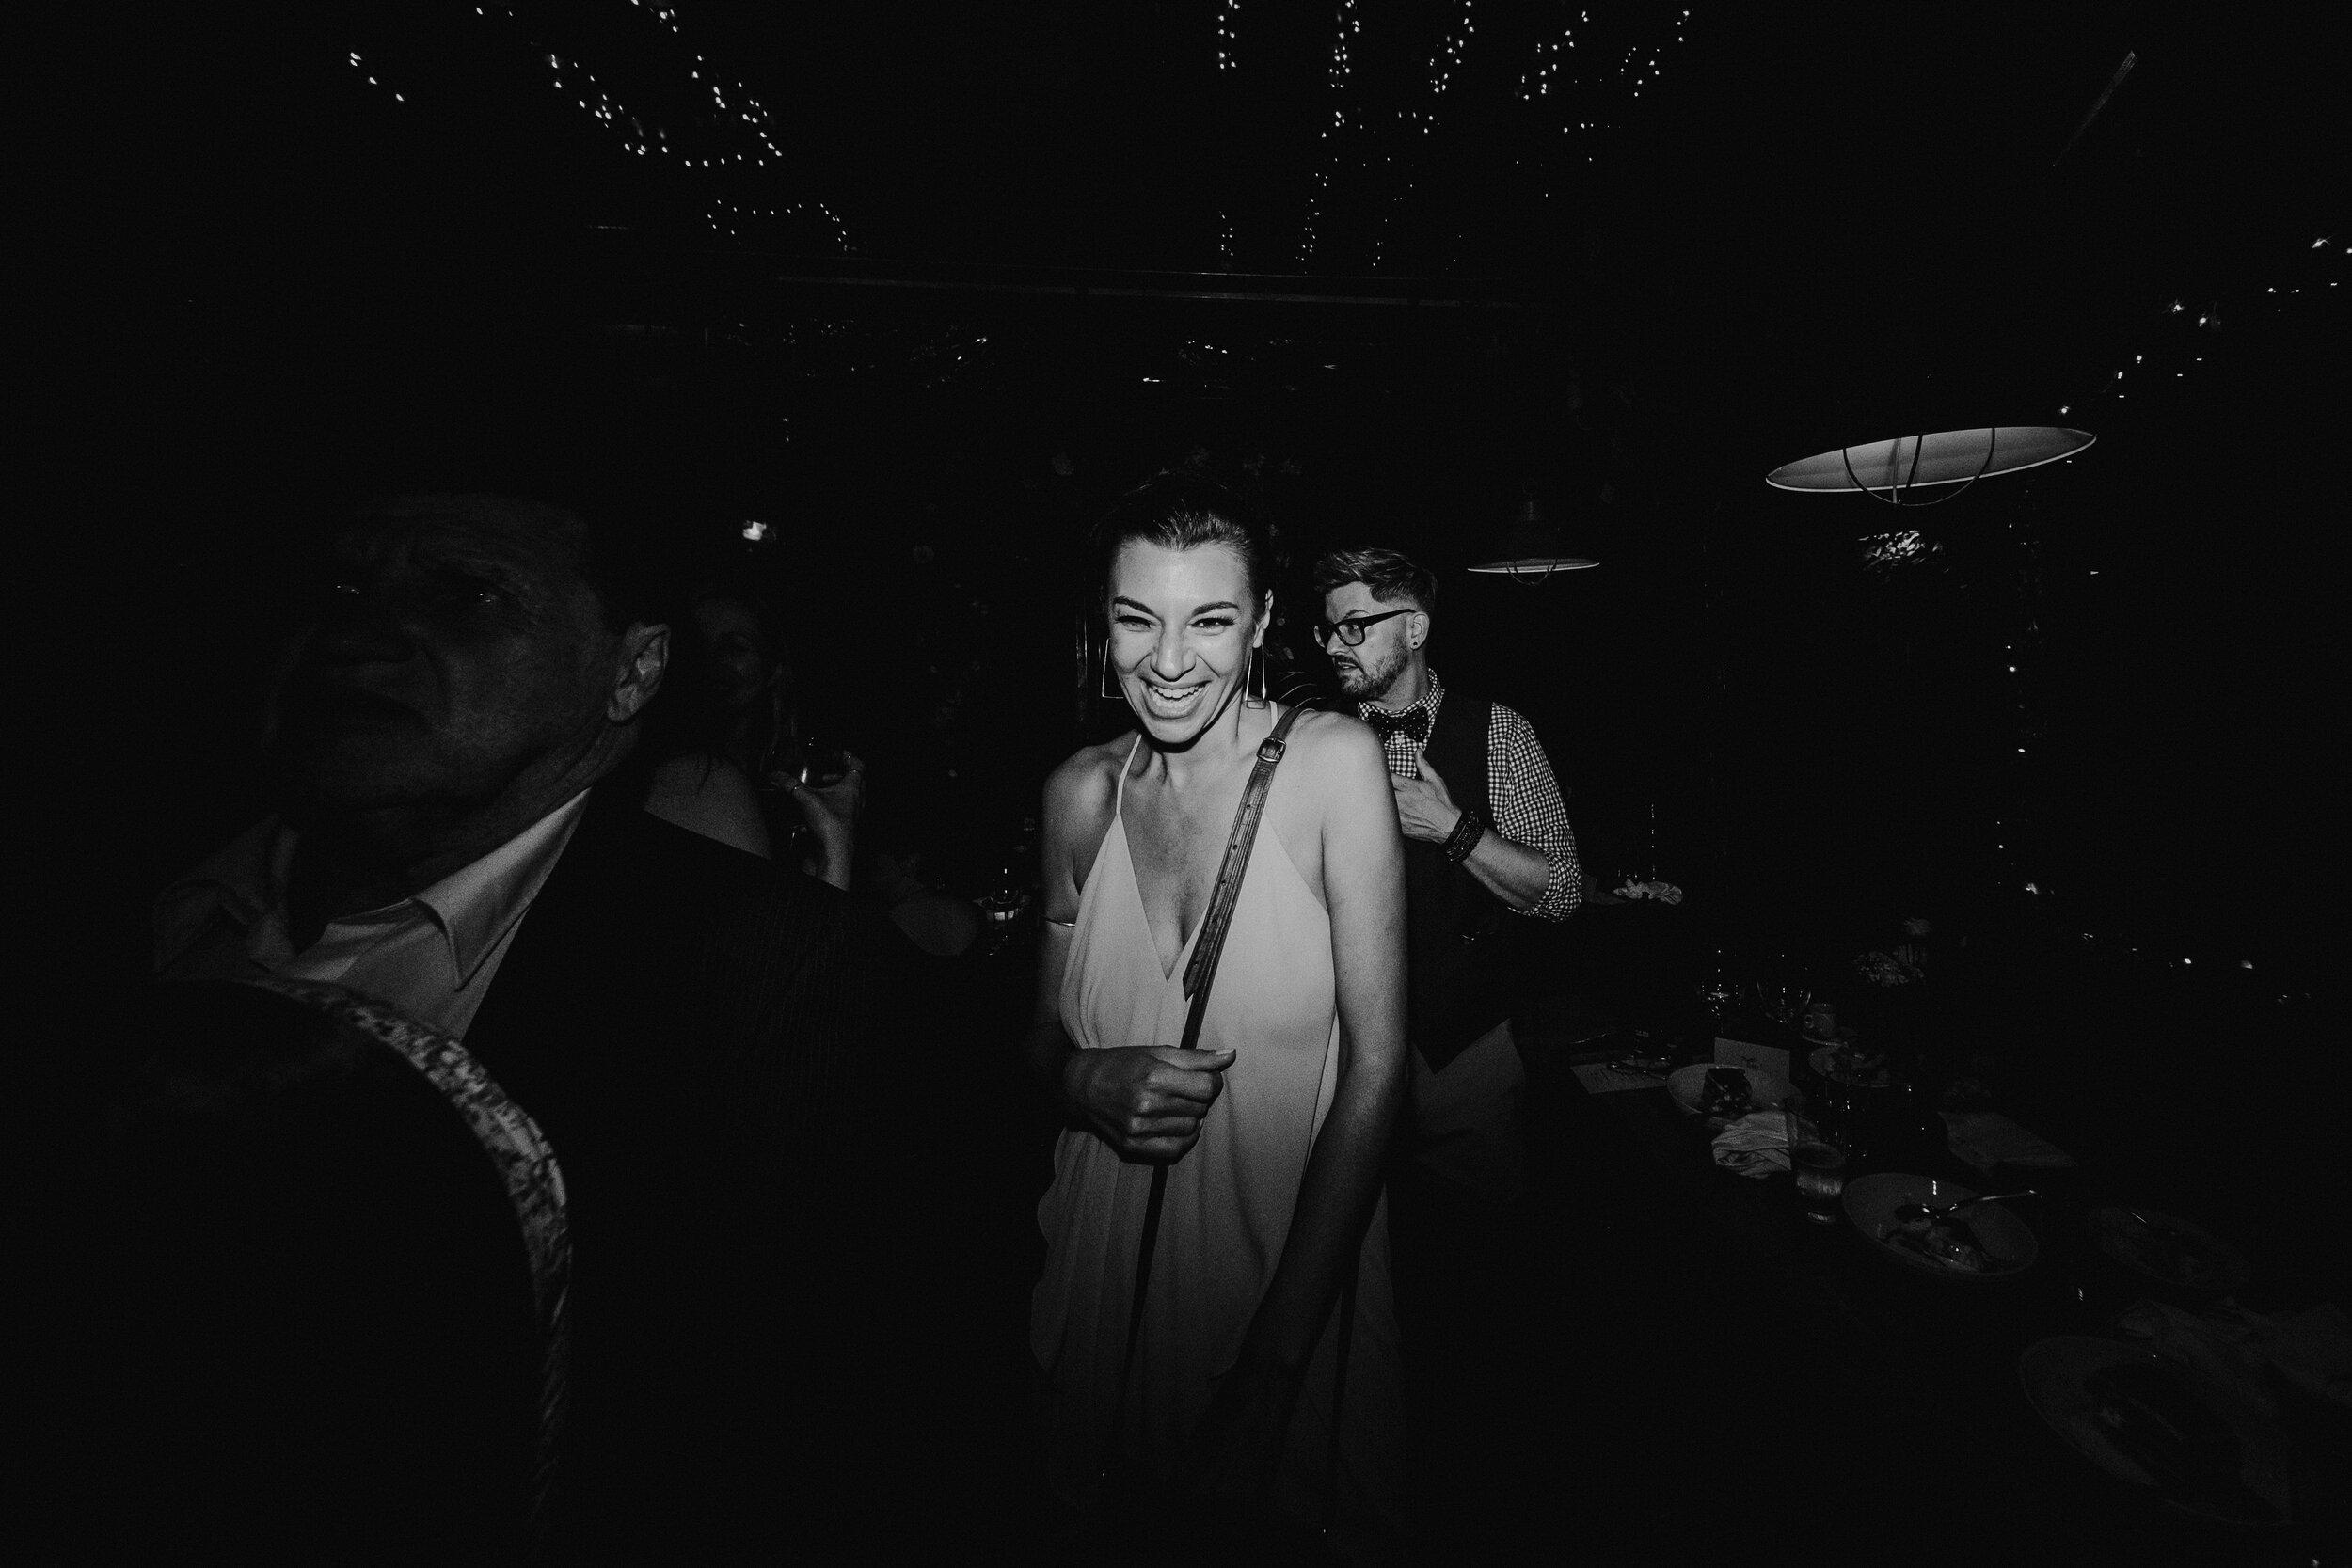 Aurora_Brooklyn_Wedding_Photographer_Chellise_Michael_Photography-538.jpg